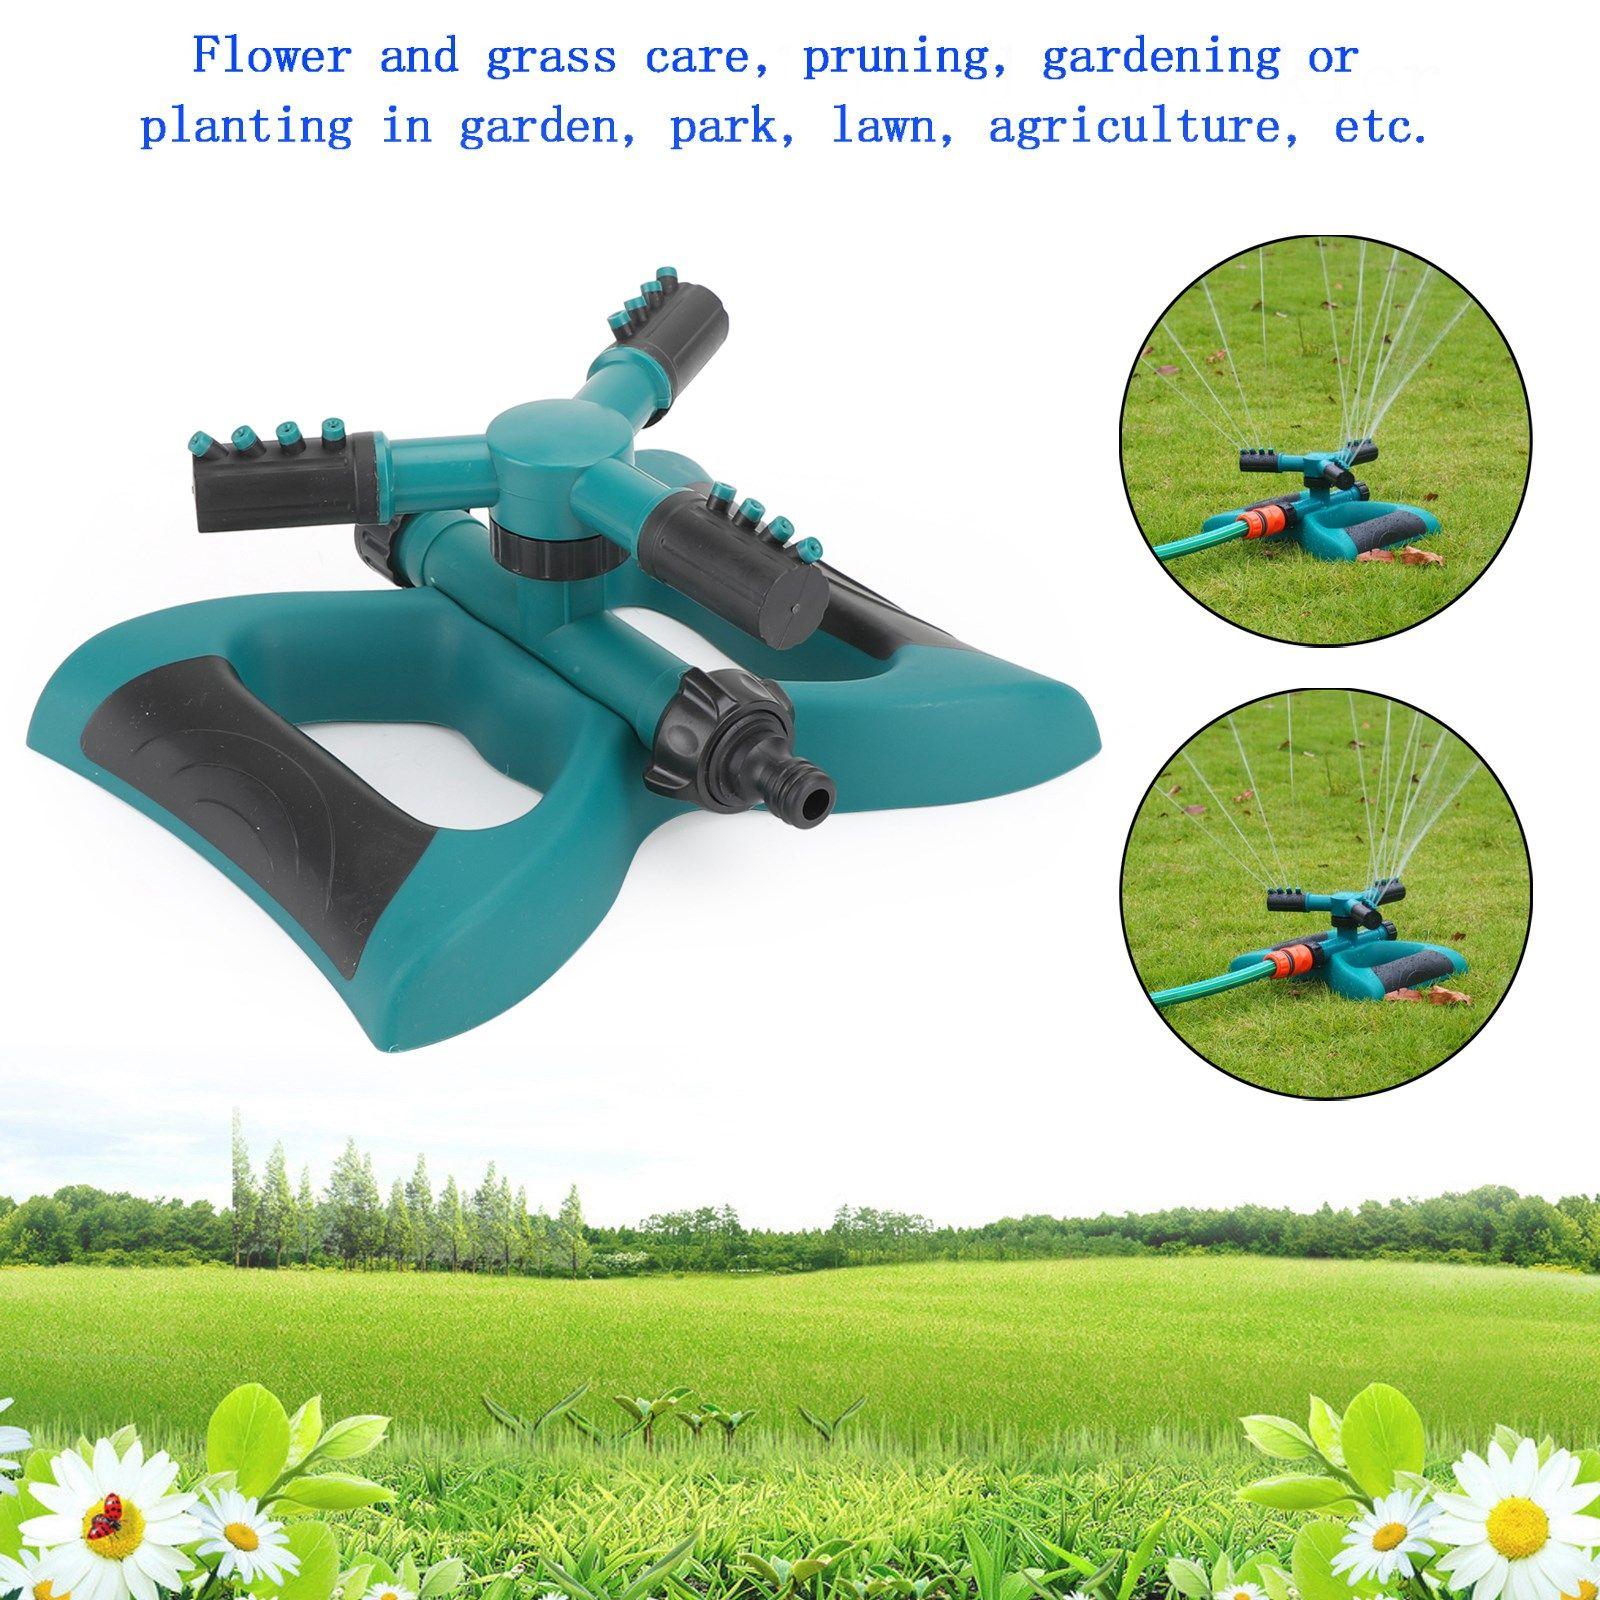 Garden Supplies Sprinkler Spray Rotating Impulse Lawn Grass Watering Hose System 360 Degree